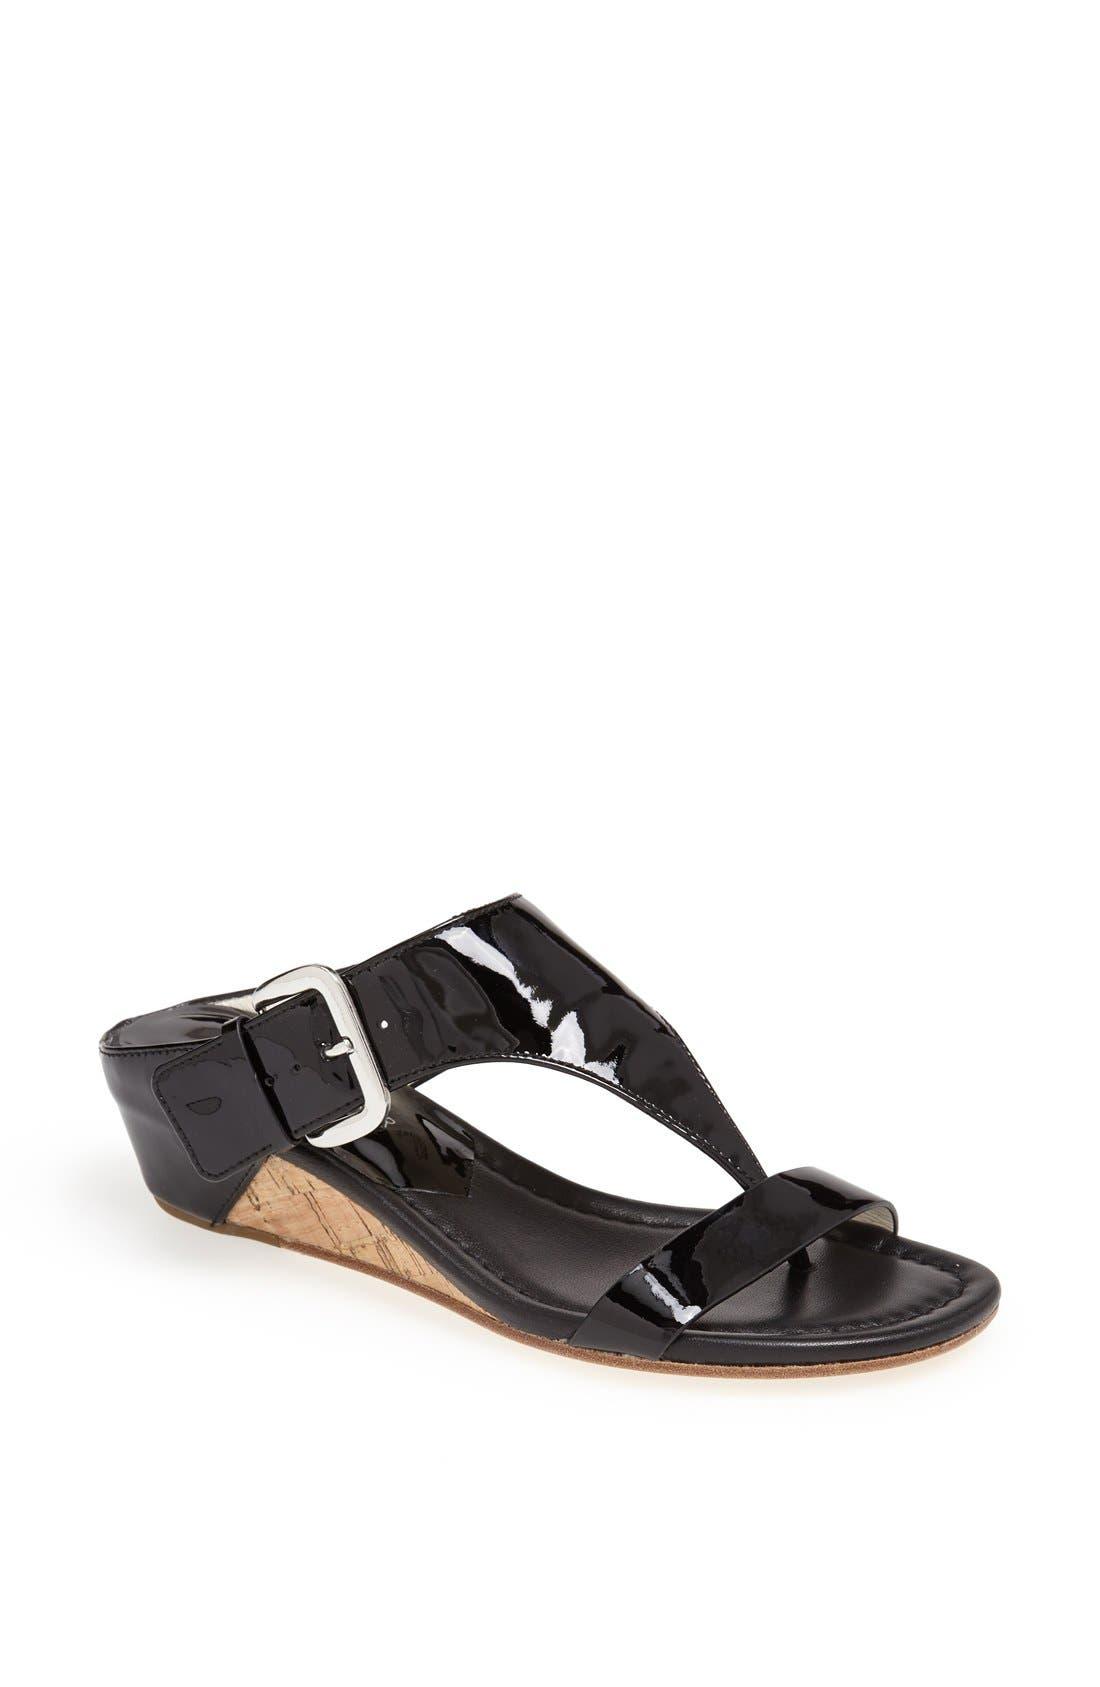 Donald J Pliner 'Doli' Sandal,                         Main,                         color,